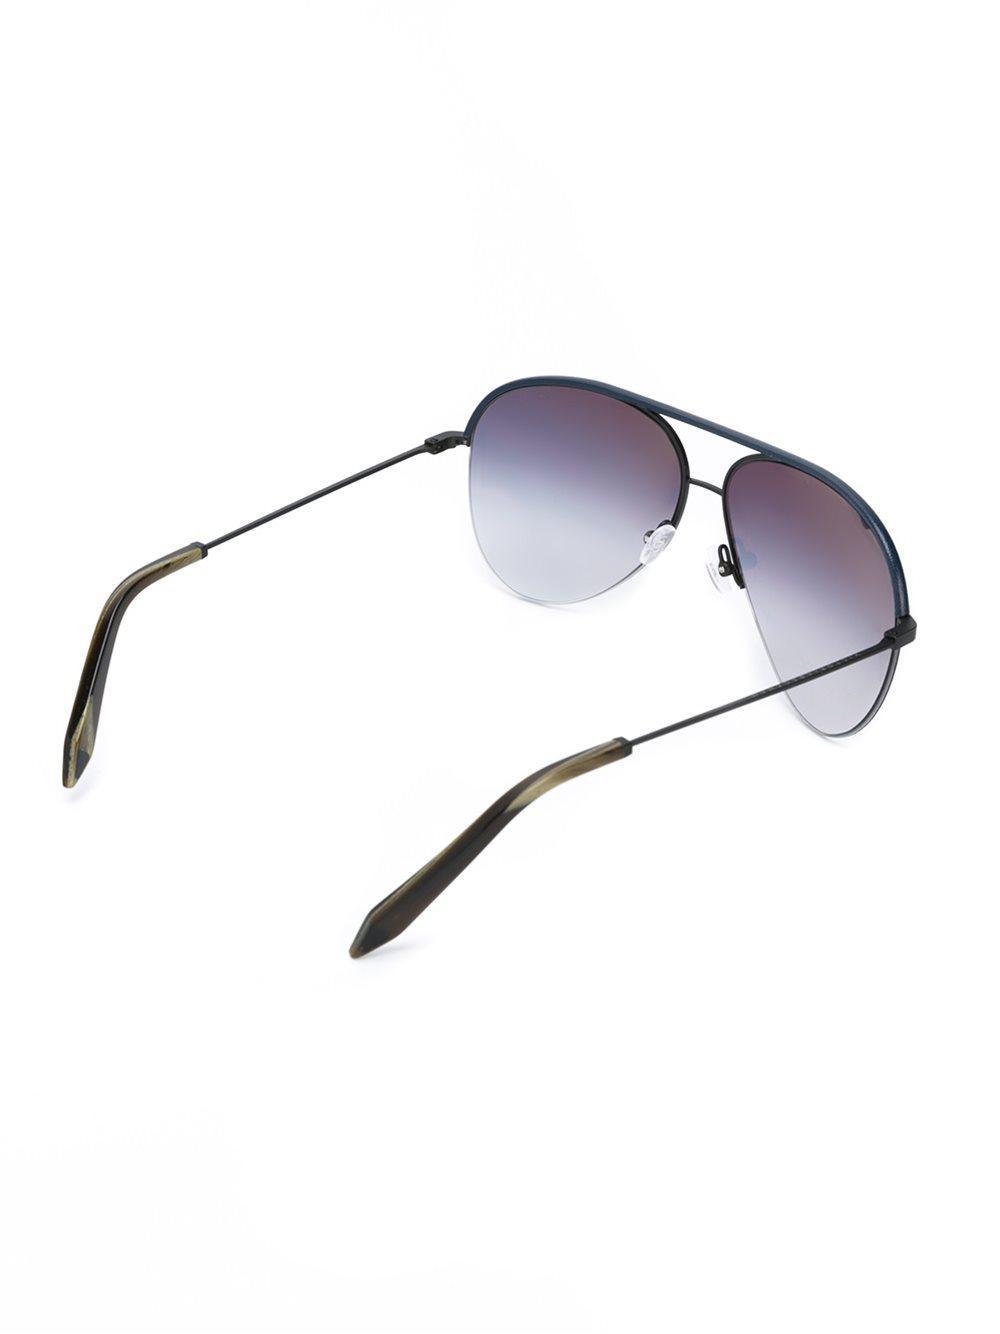 1db7334671 Victoria Beckham Aviator Frame Sunglasses in Blue - Lyst